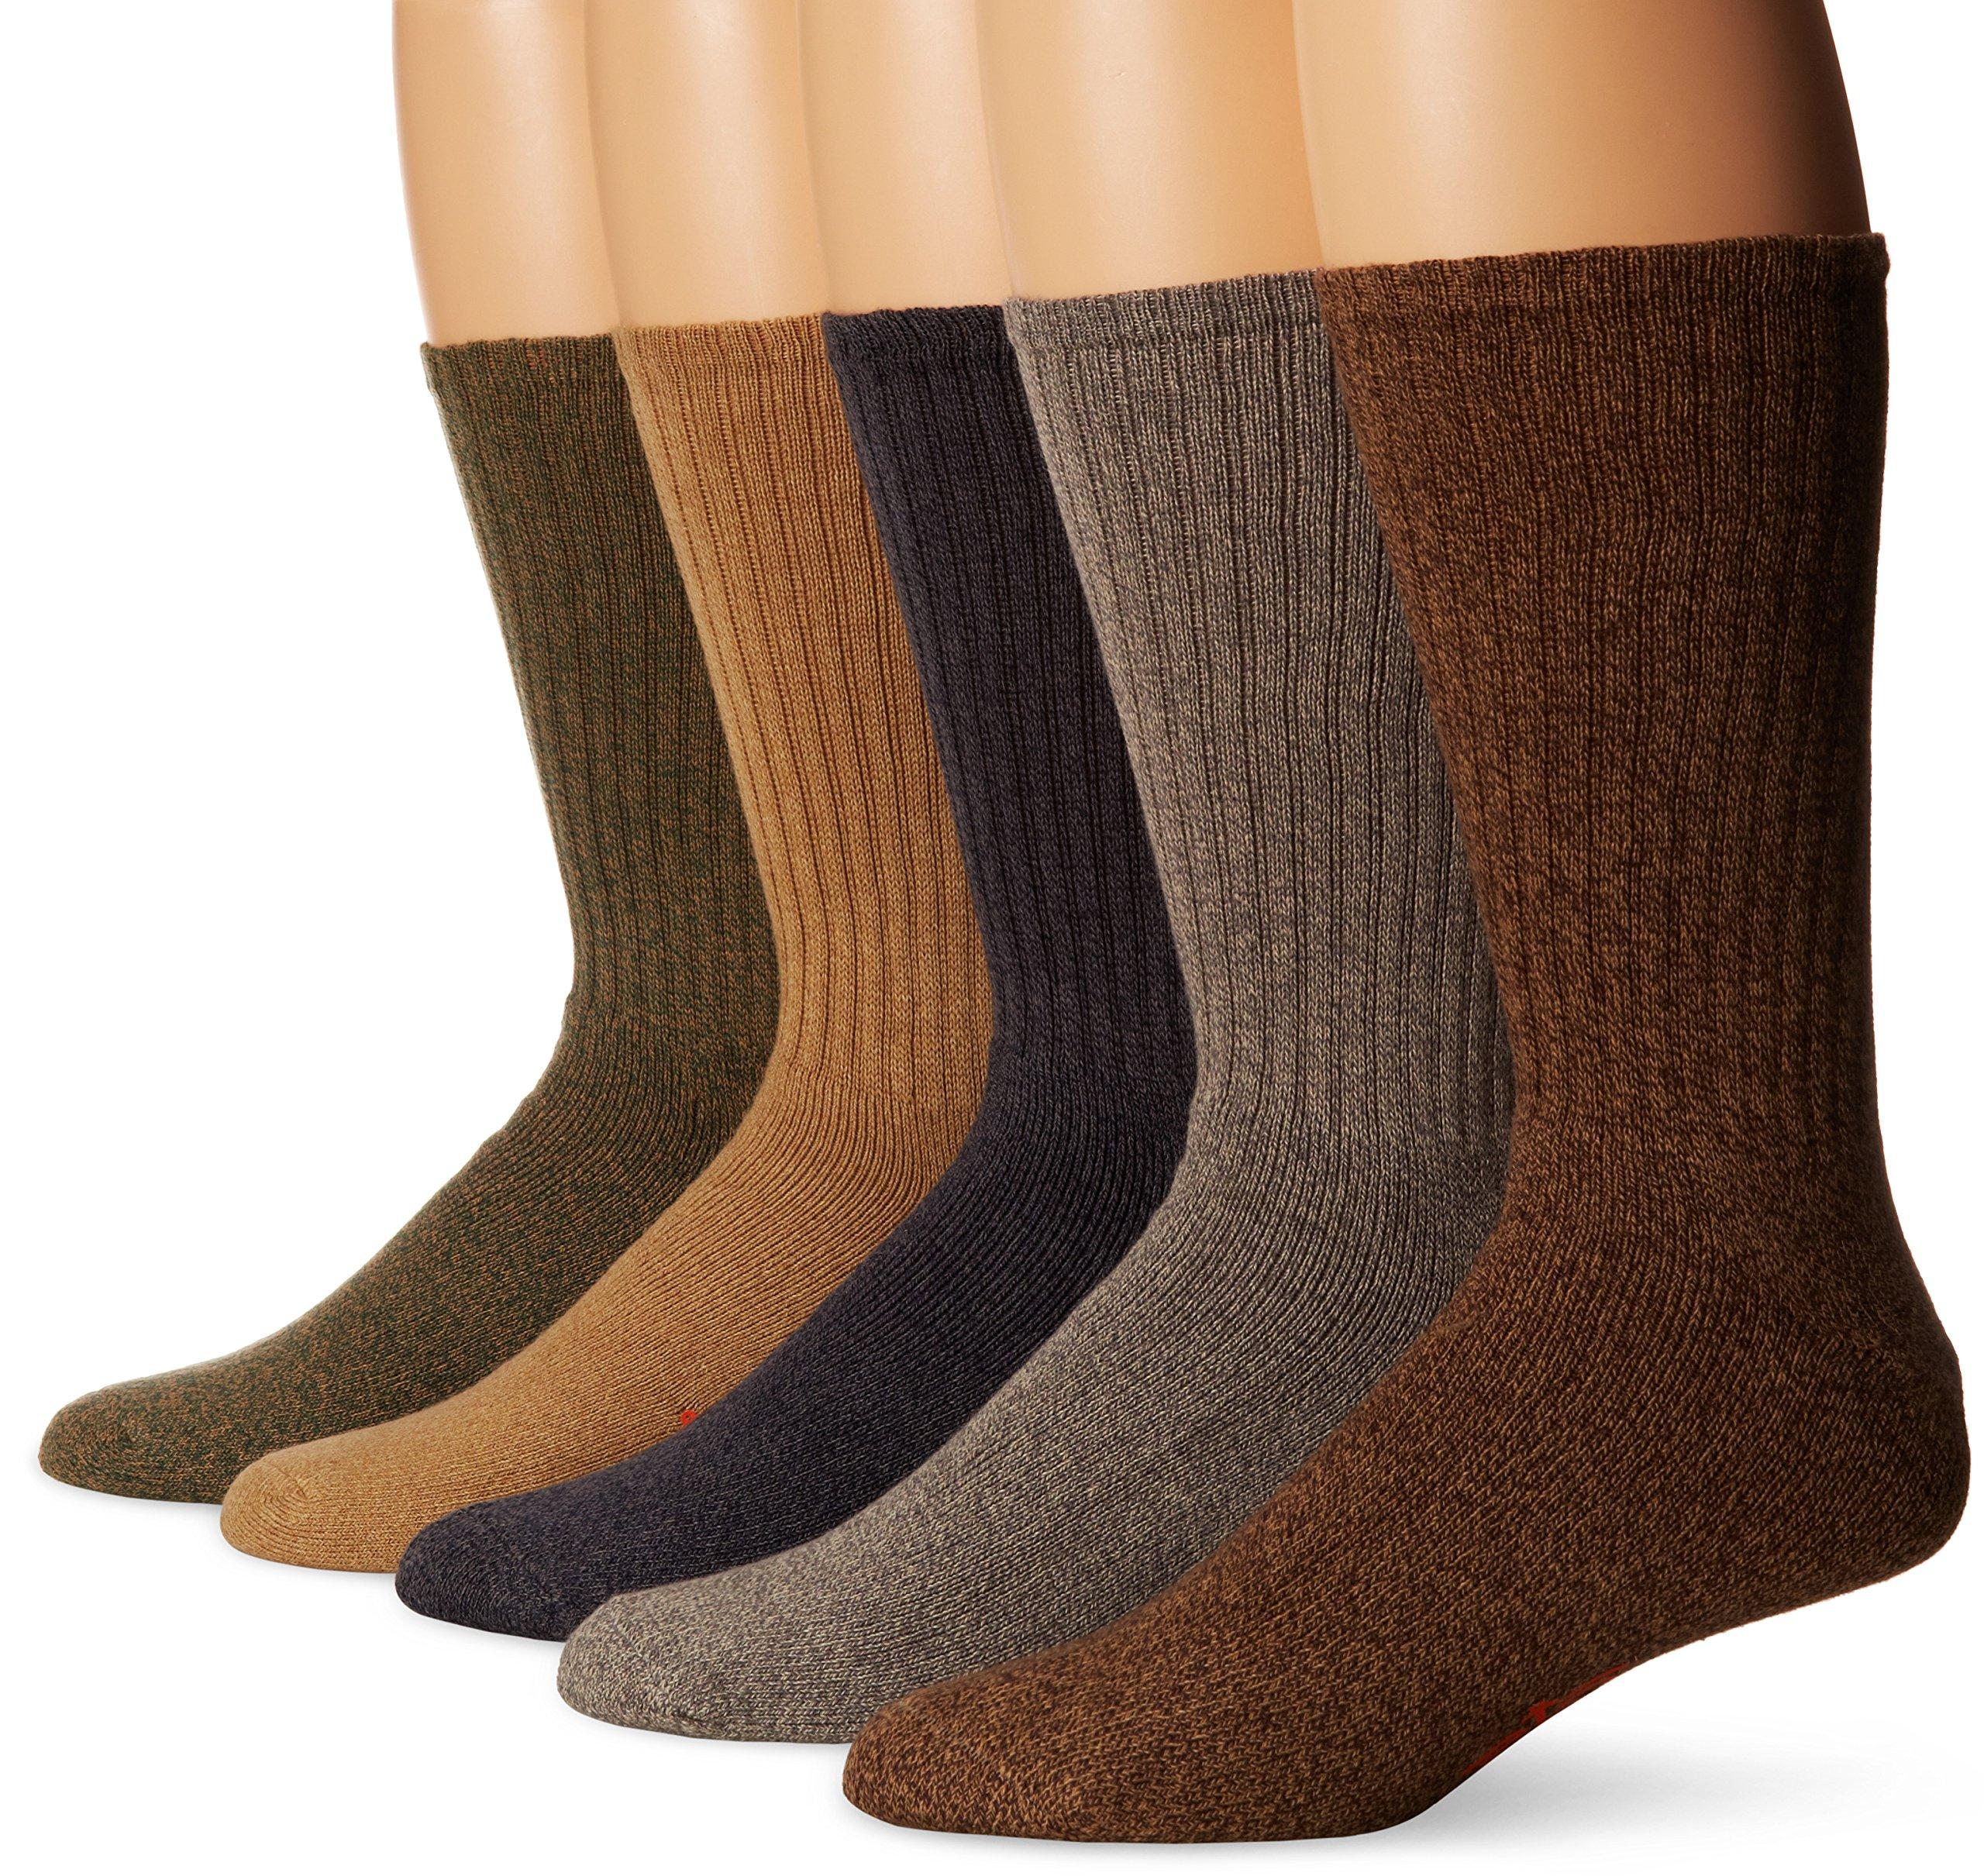 Dockers 5 Pack Cushion Comfort Sport Crew Socks Dark Assorted Sock Size: 10-13/Shoe Size: 6-12